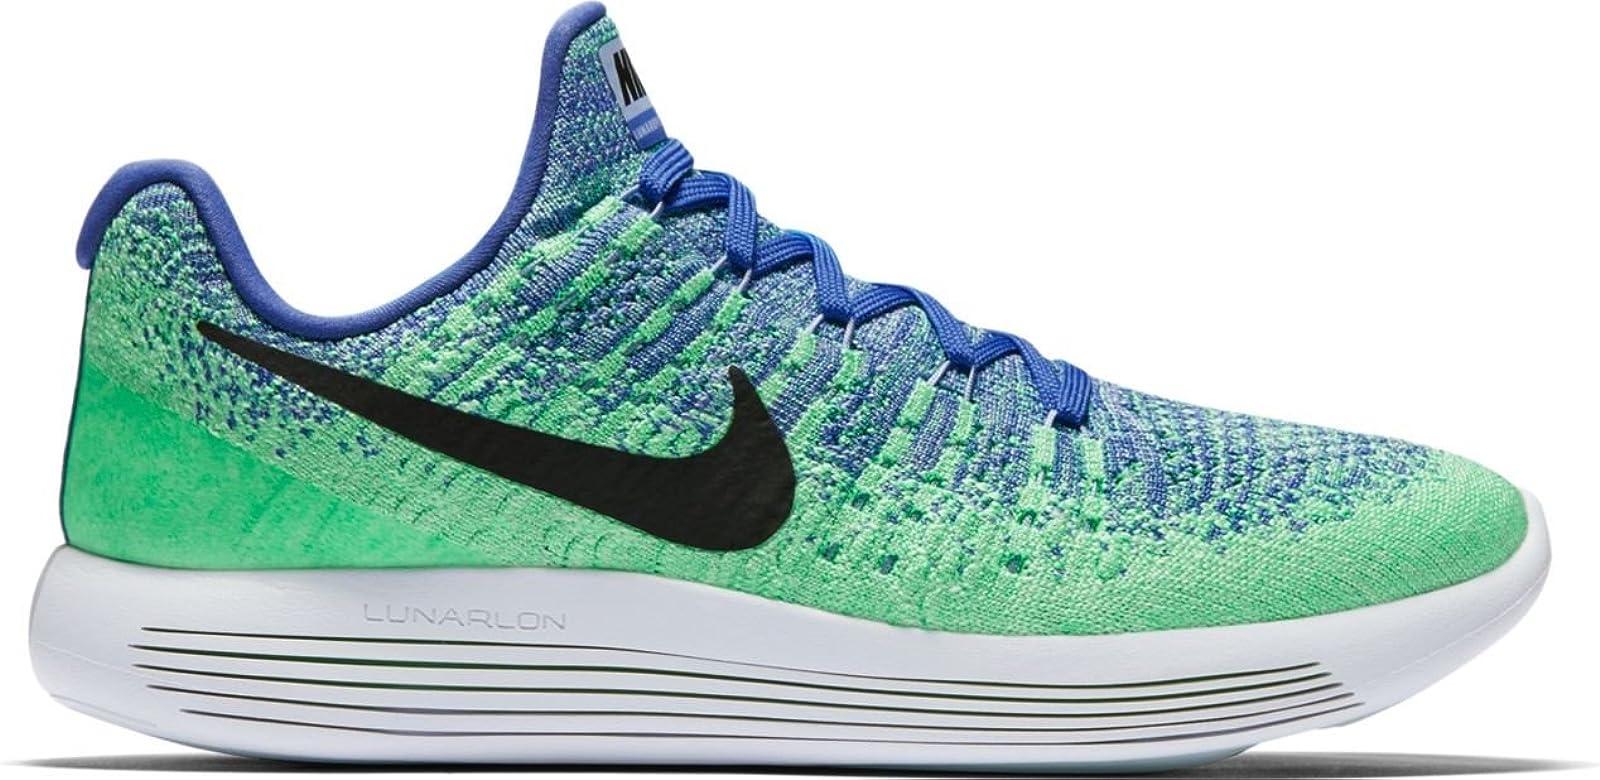 Womens Nike LunarEpic Low Flyknit 2 Running Variation - 1